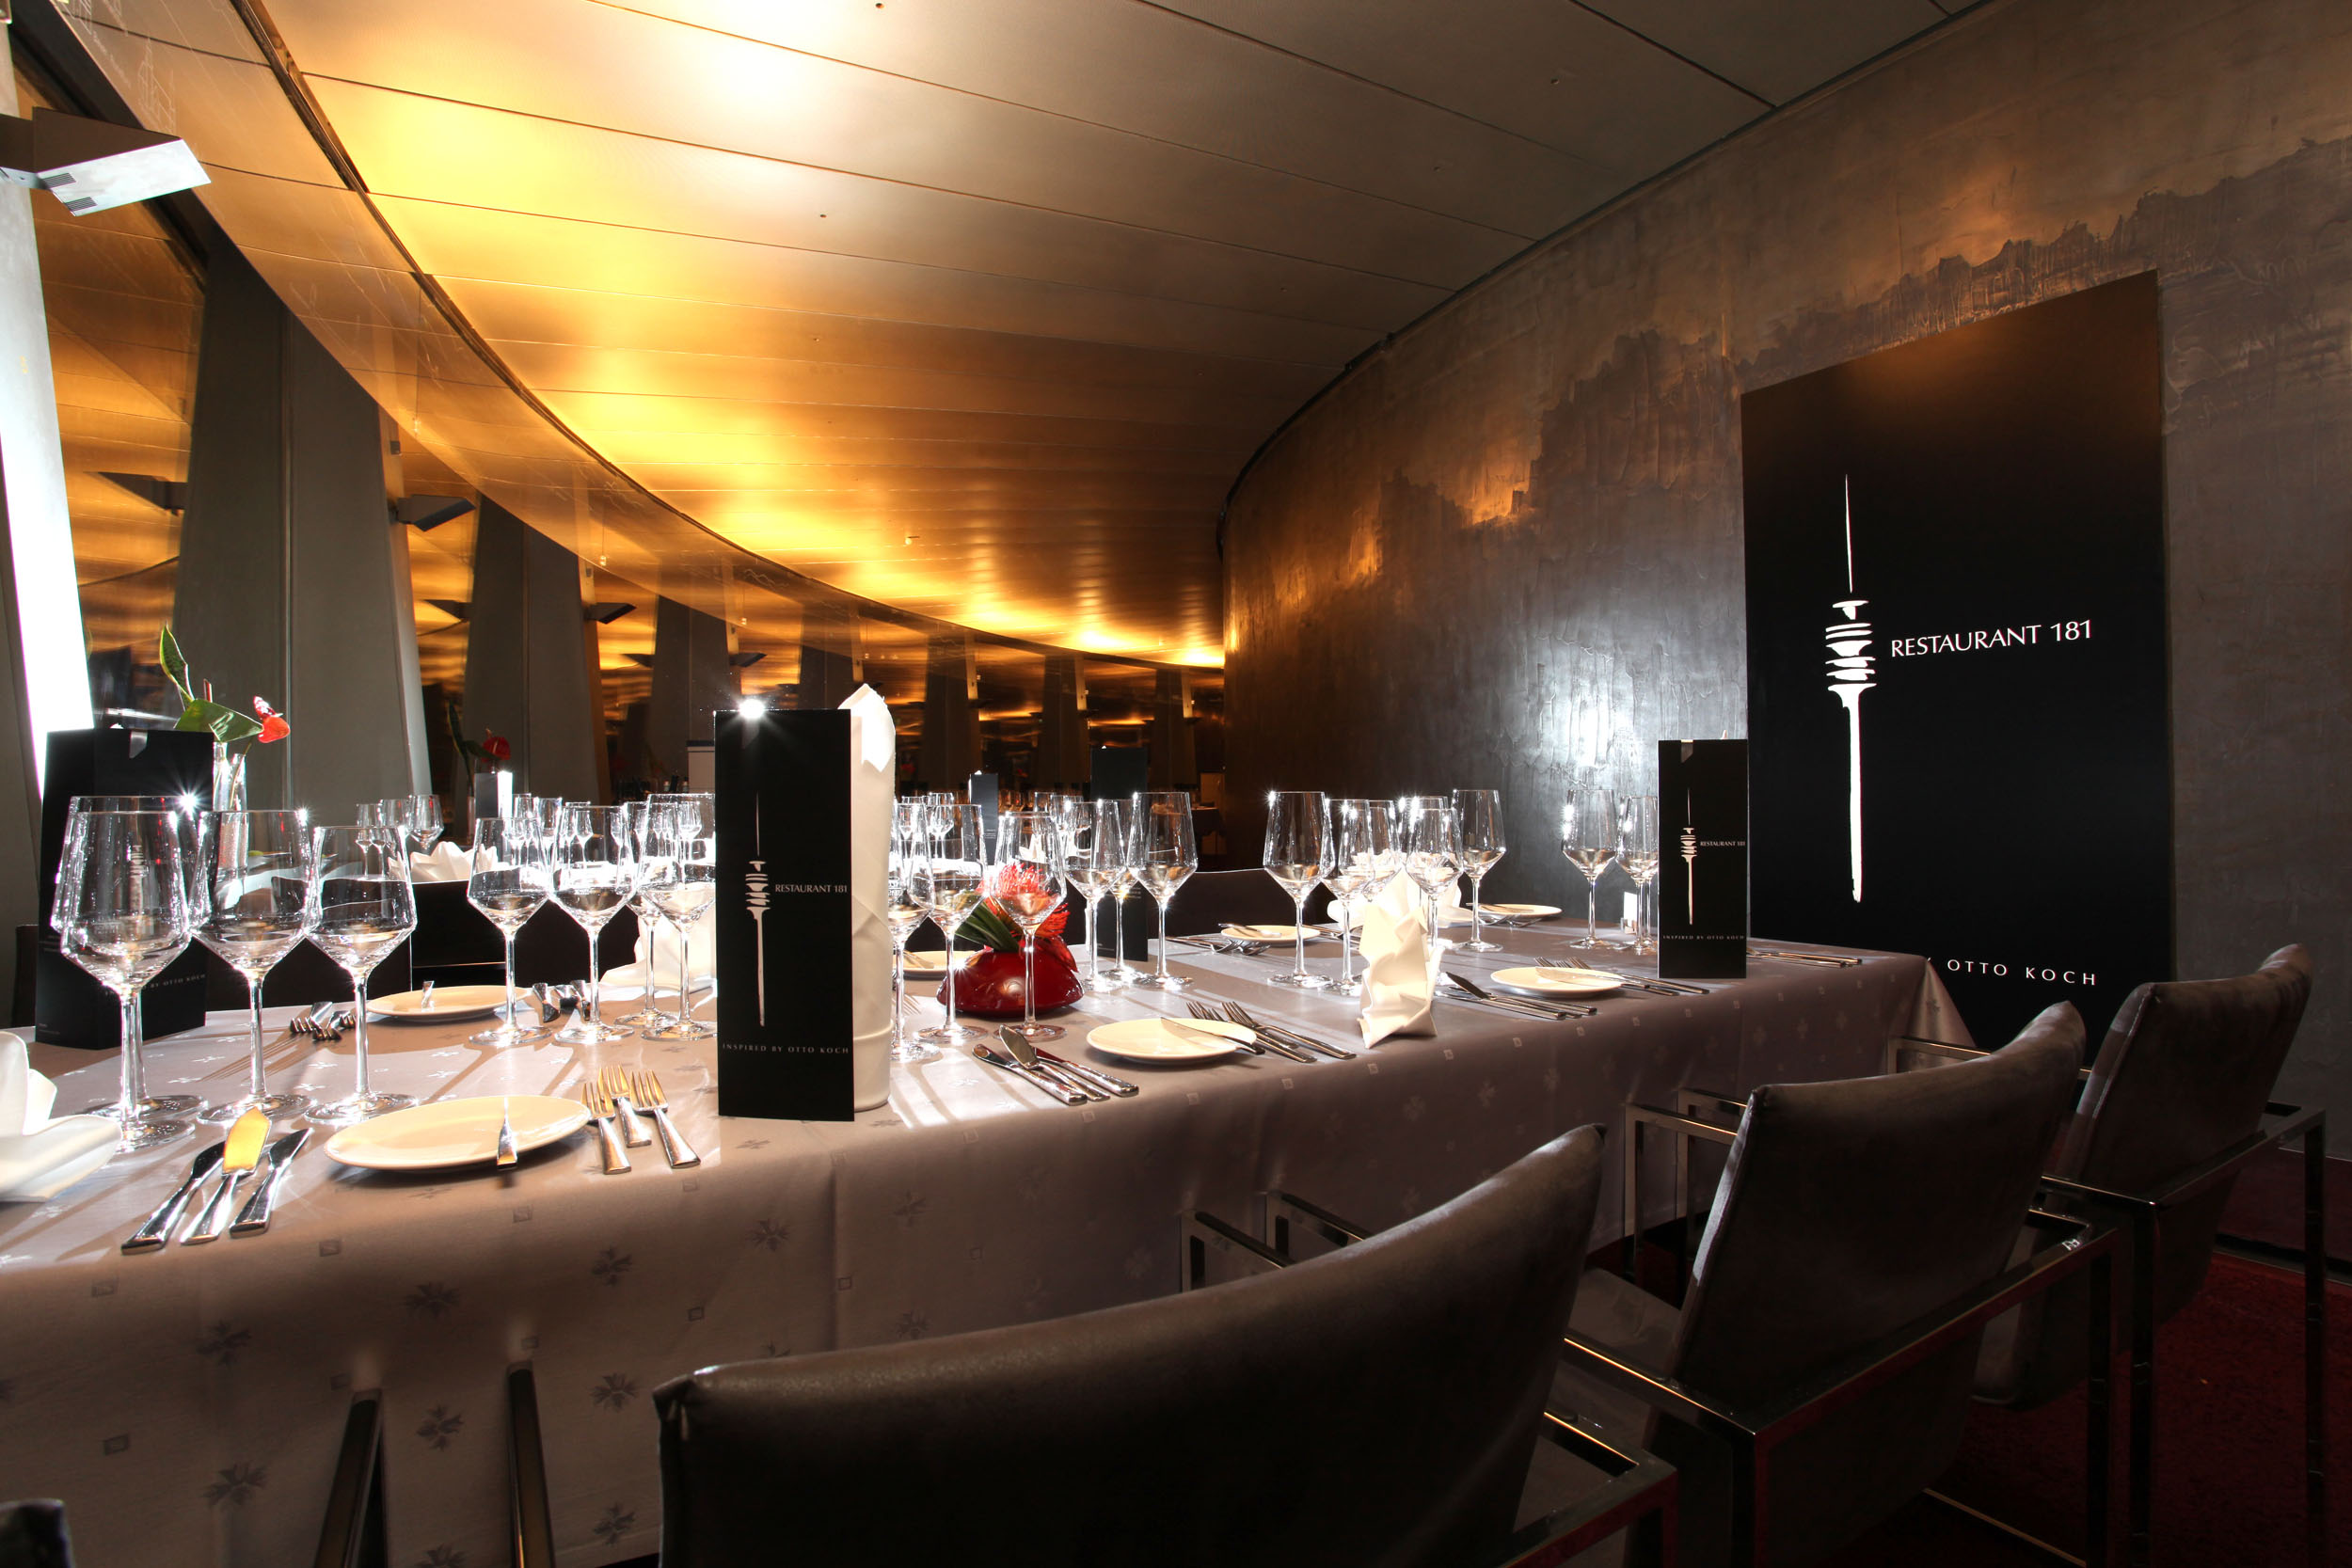 Top Rotating Restaurants Restaurant 181 Munich Germany Interior View